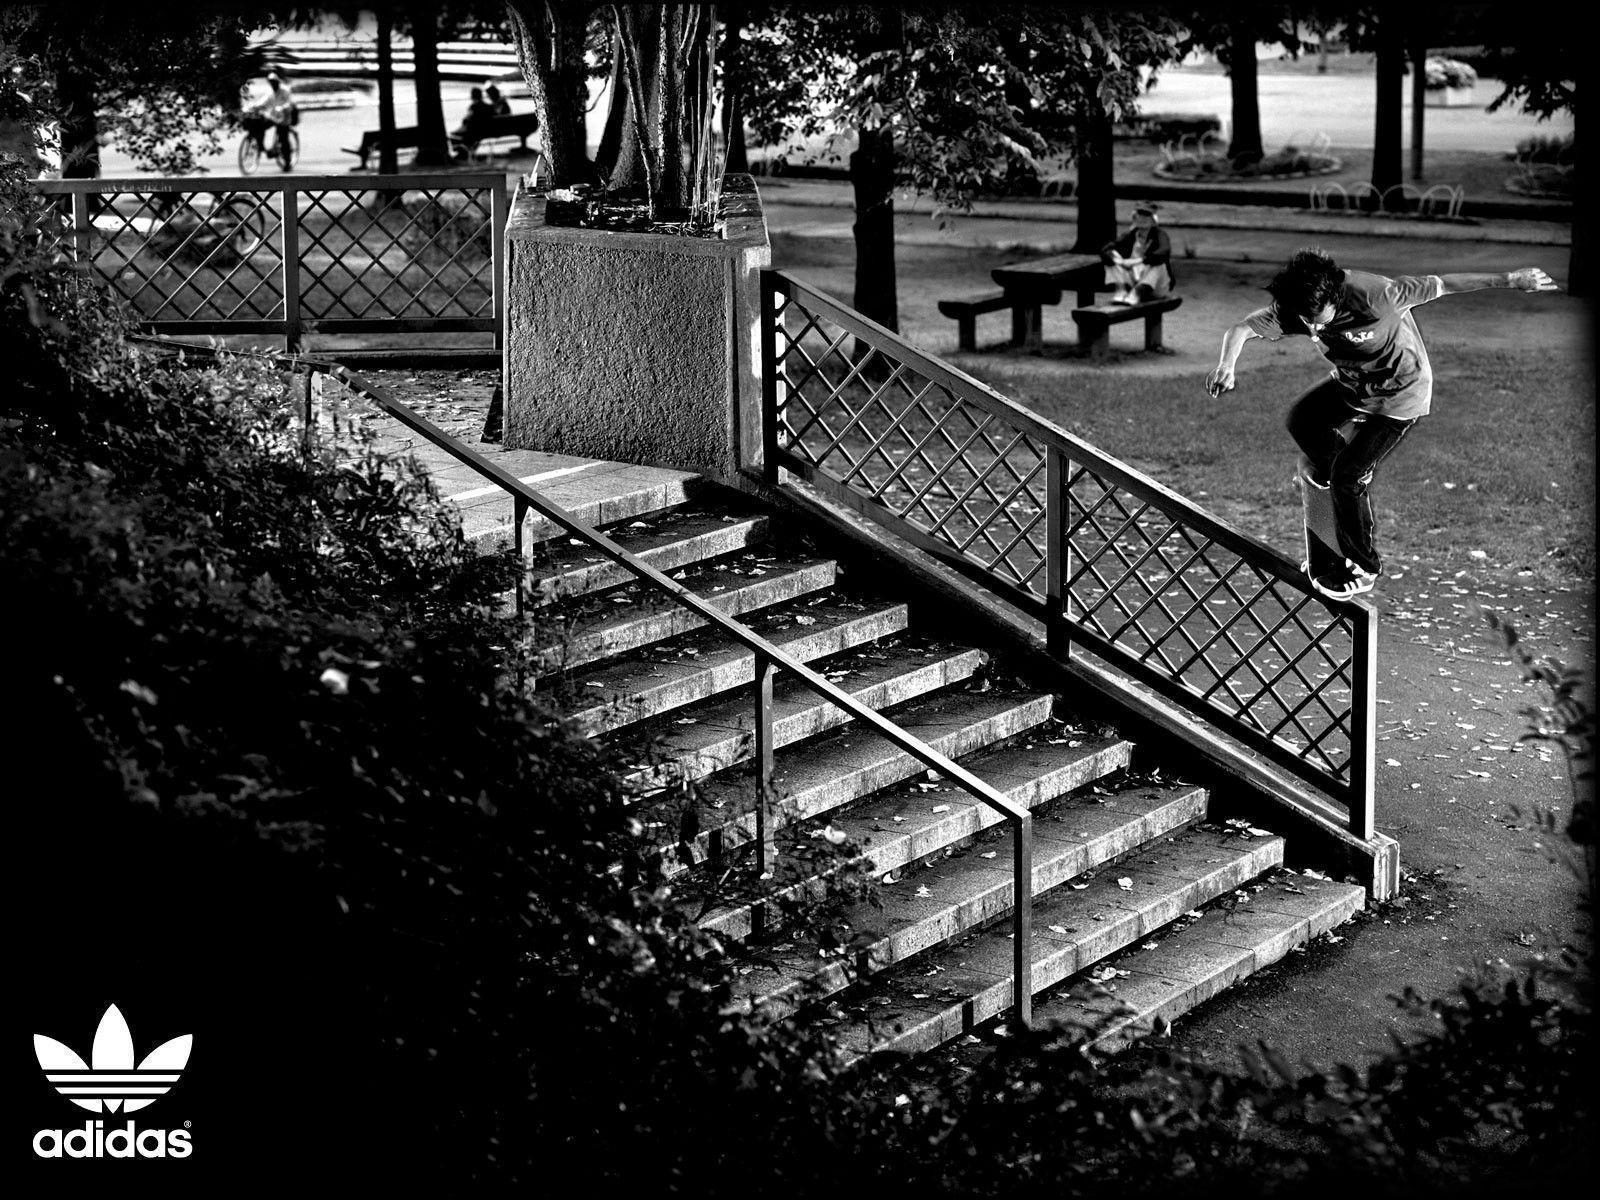 adidas skateboarding Wallpaper 1600x1200